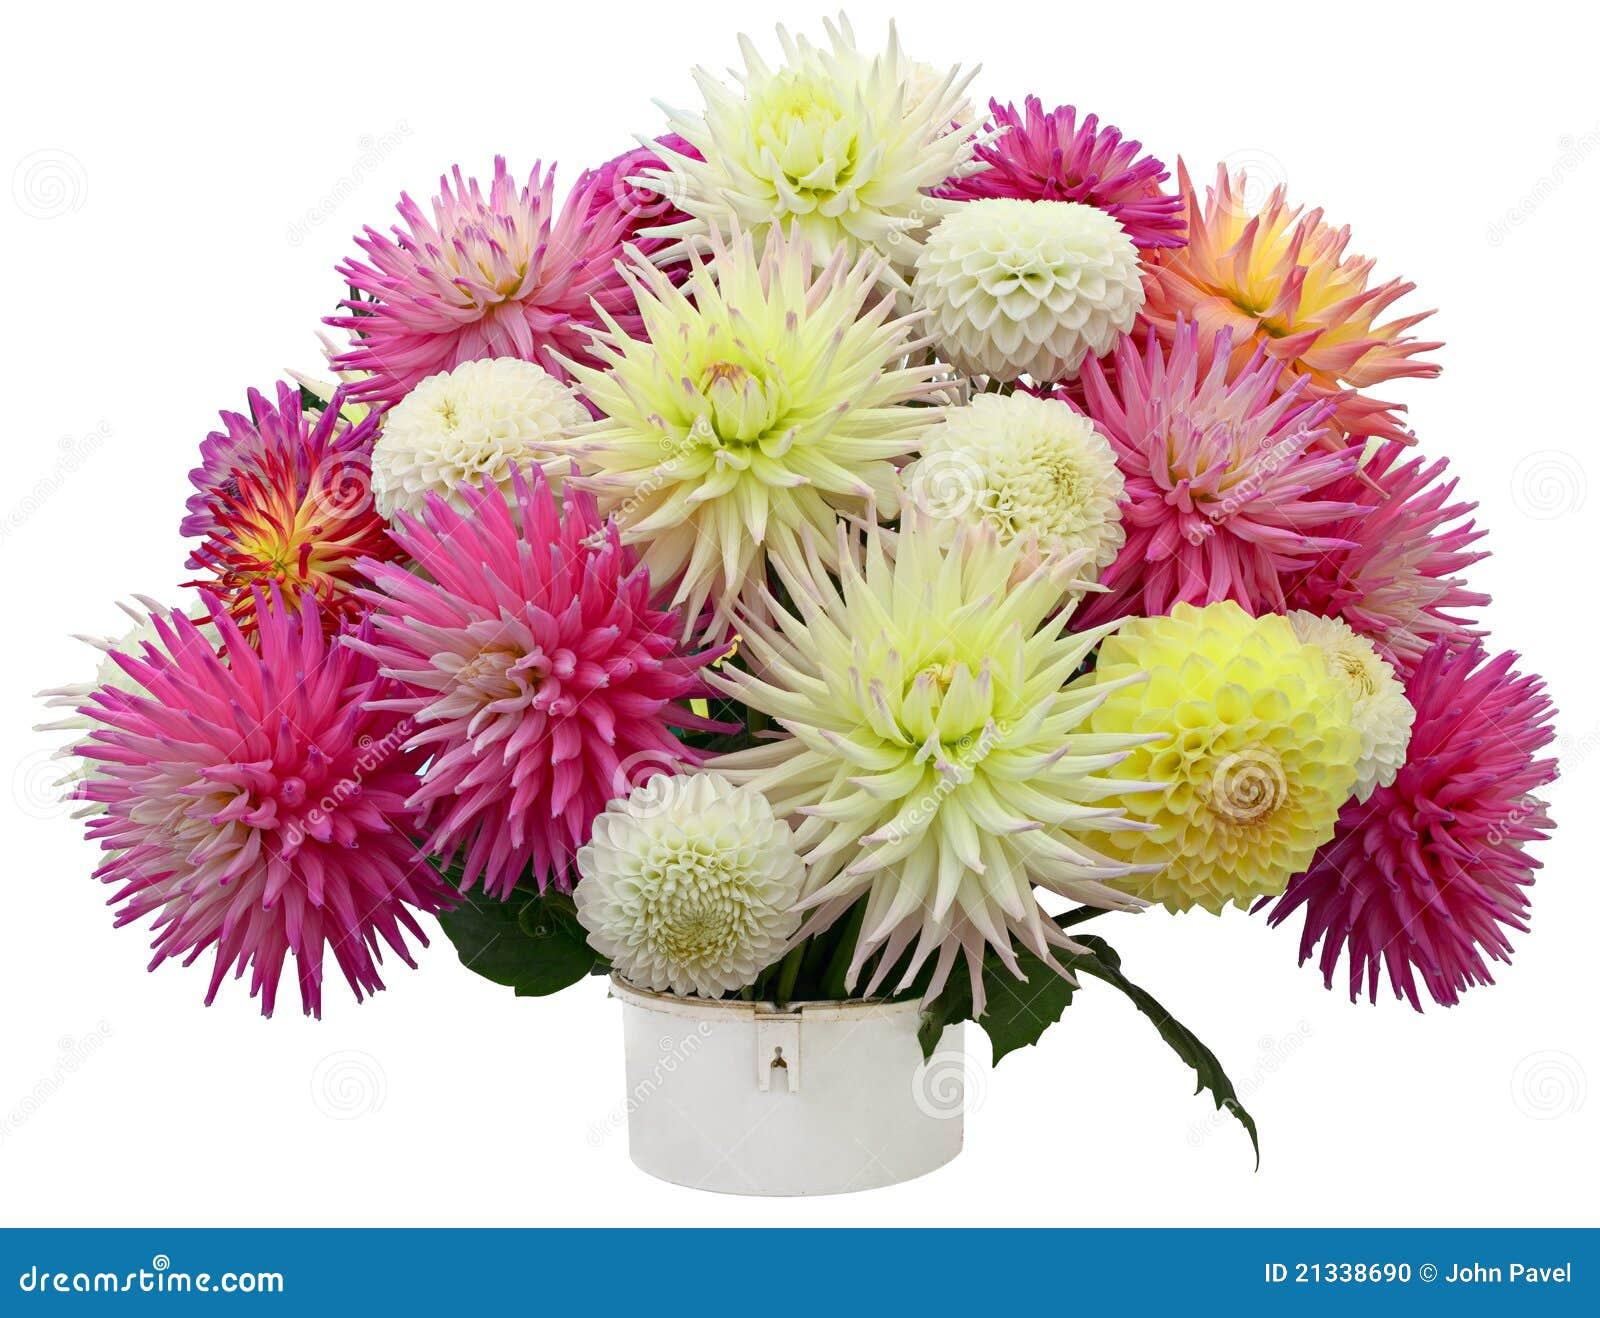 Flower Arrangement Of Chrysanthemums And Dahlias Stock